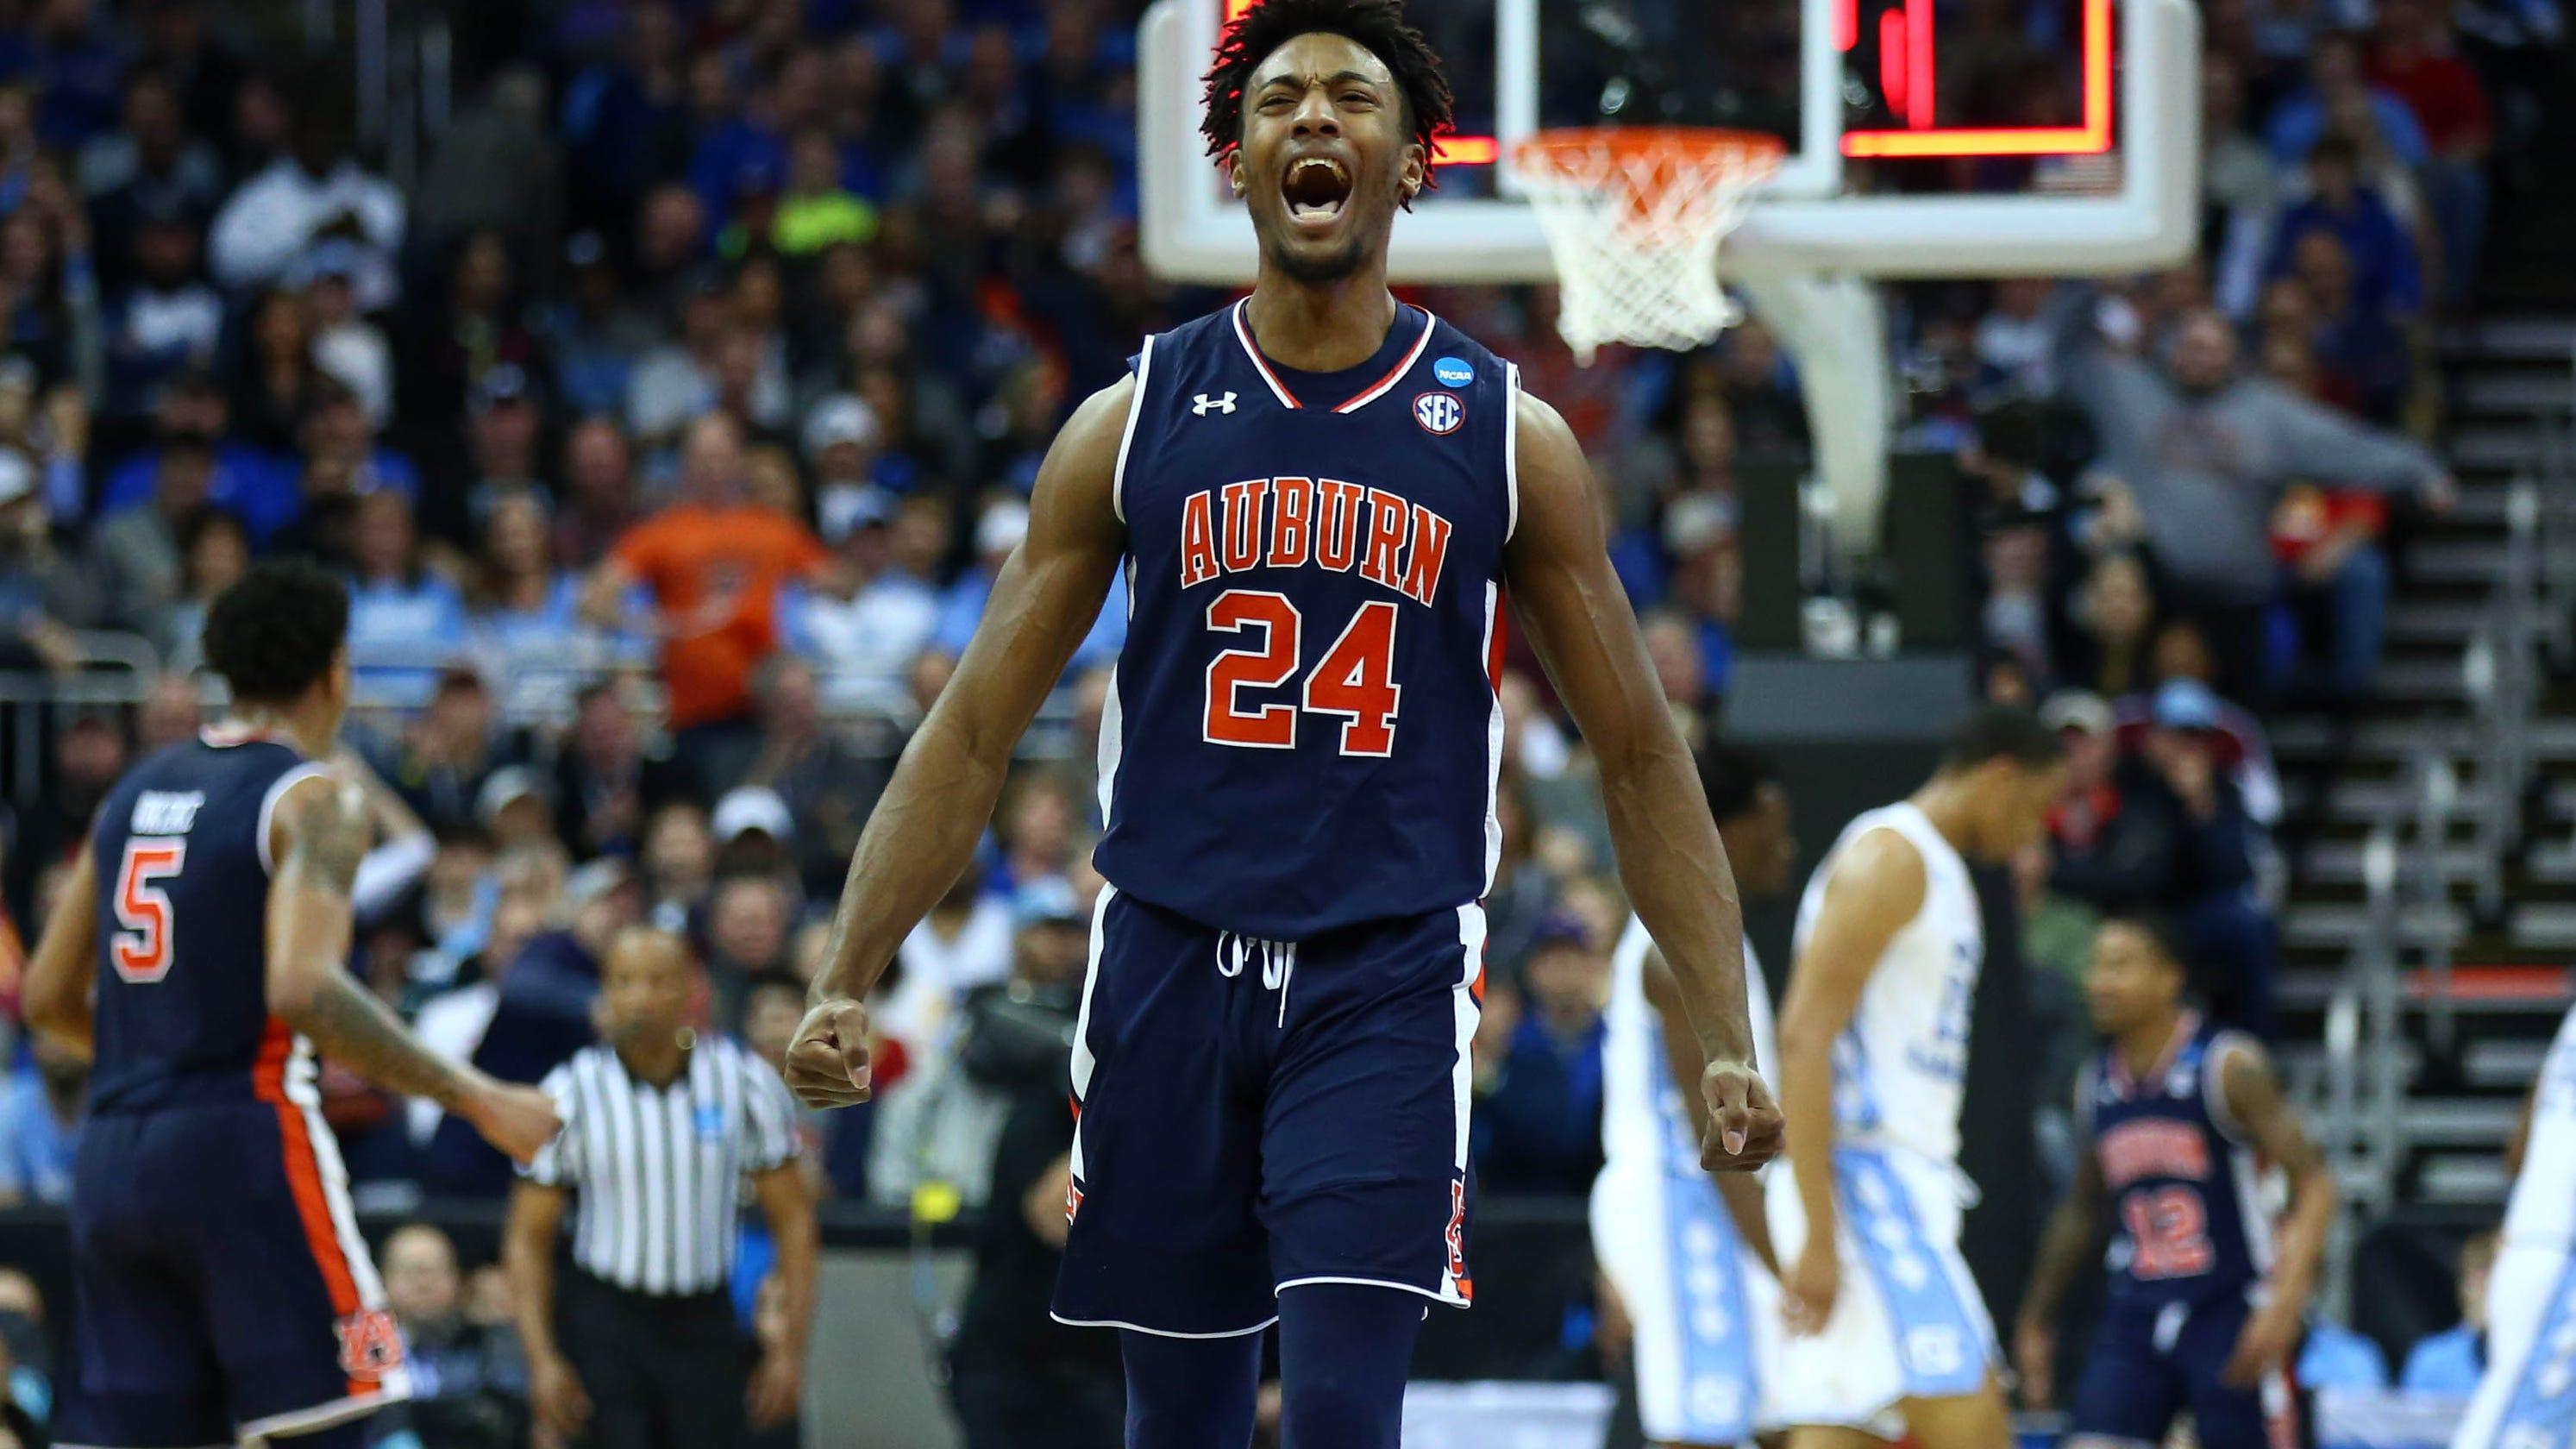 March Madness: Auburn knocks off top seed North Carolina ...